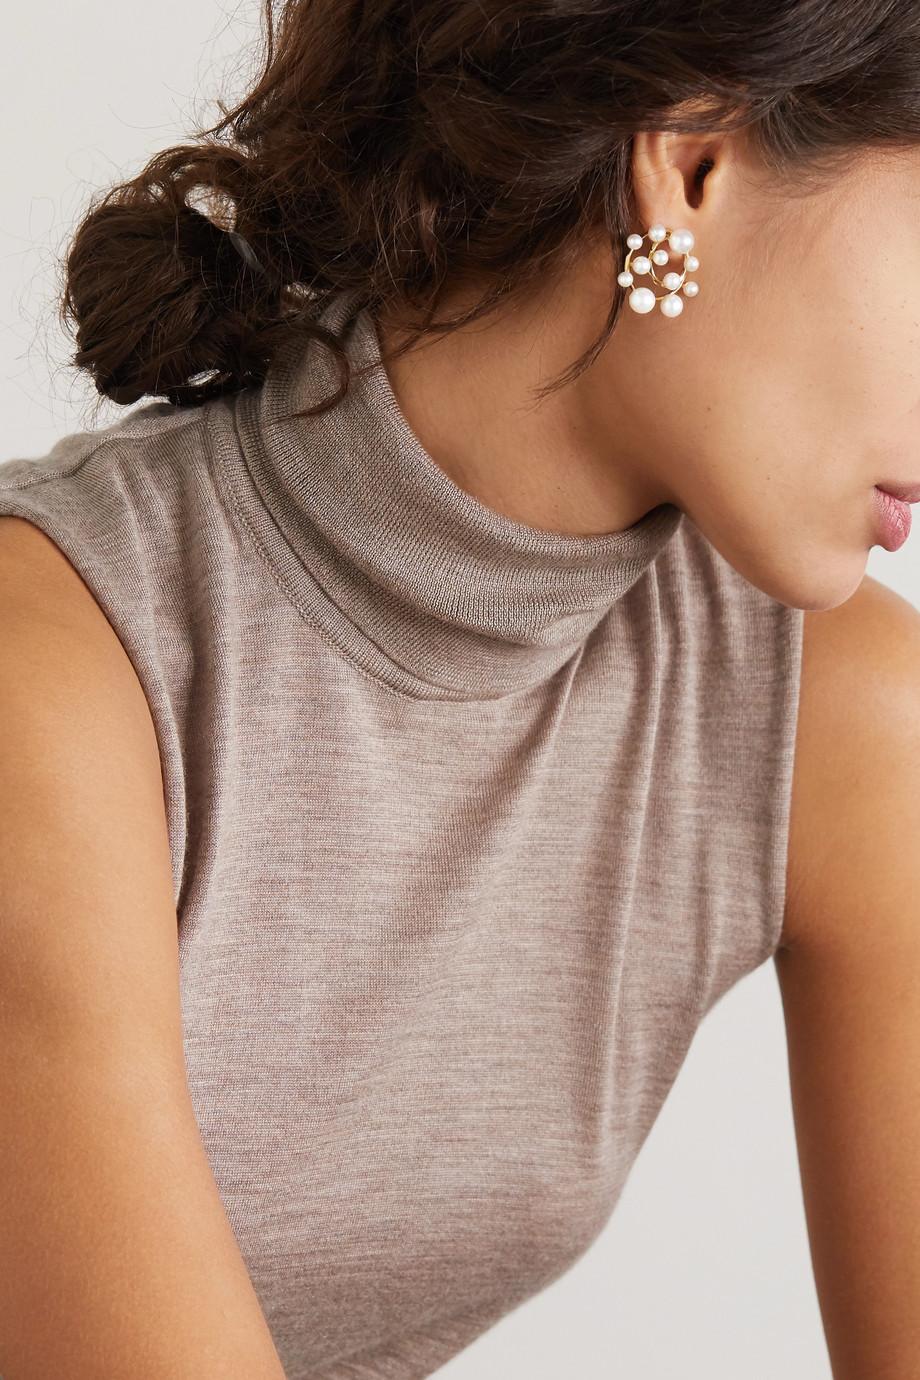 Ippolita Nova 18-karat gold pearl earrings